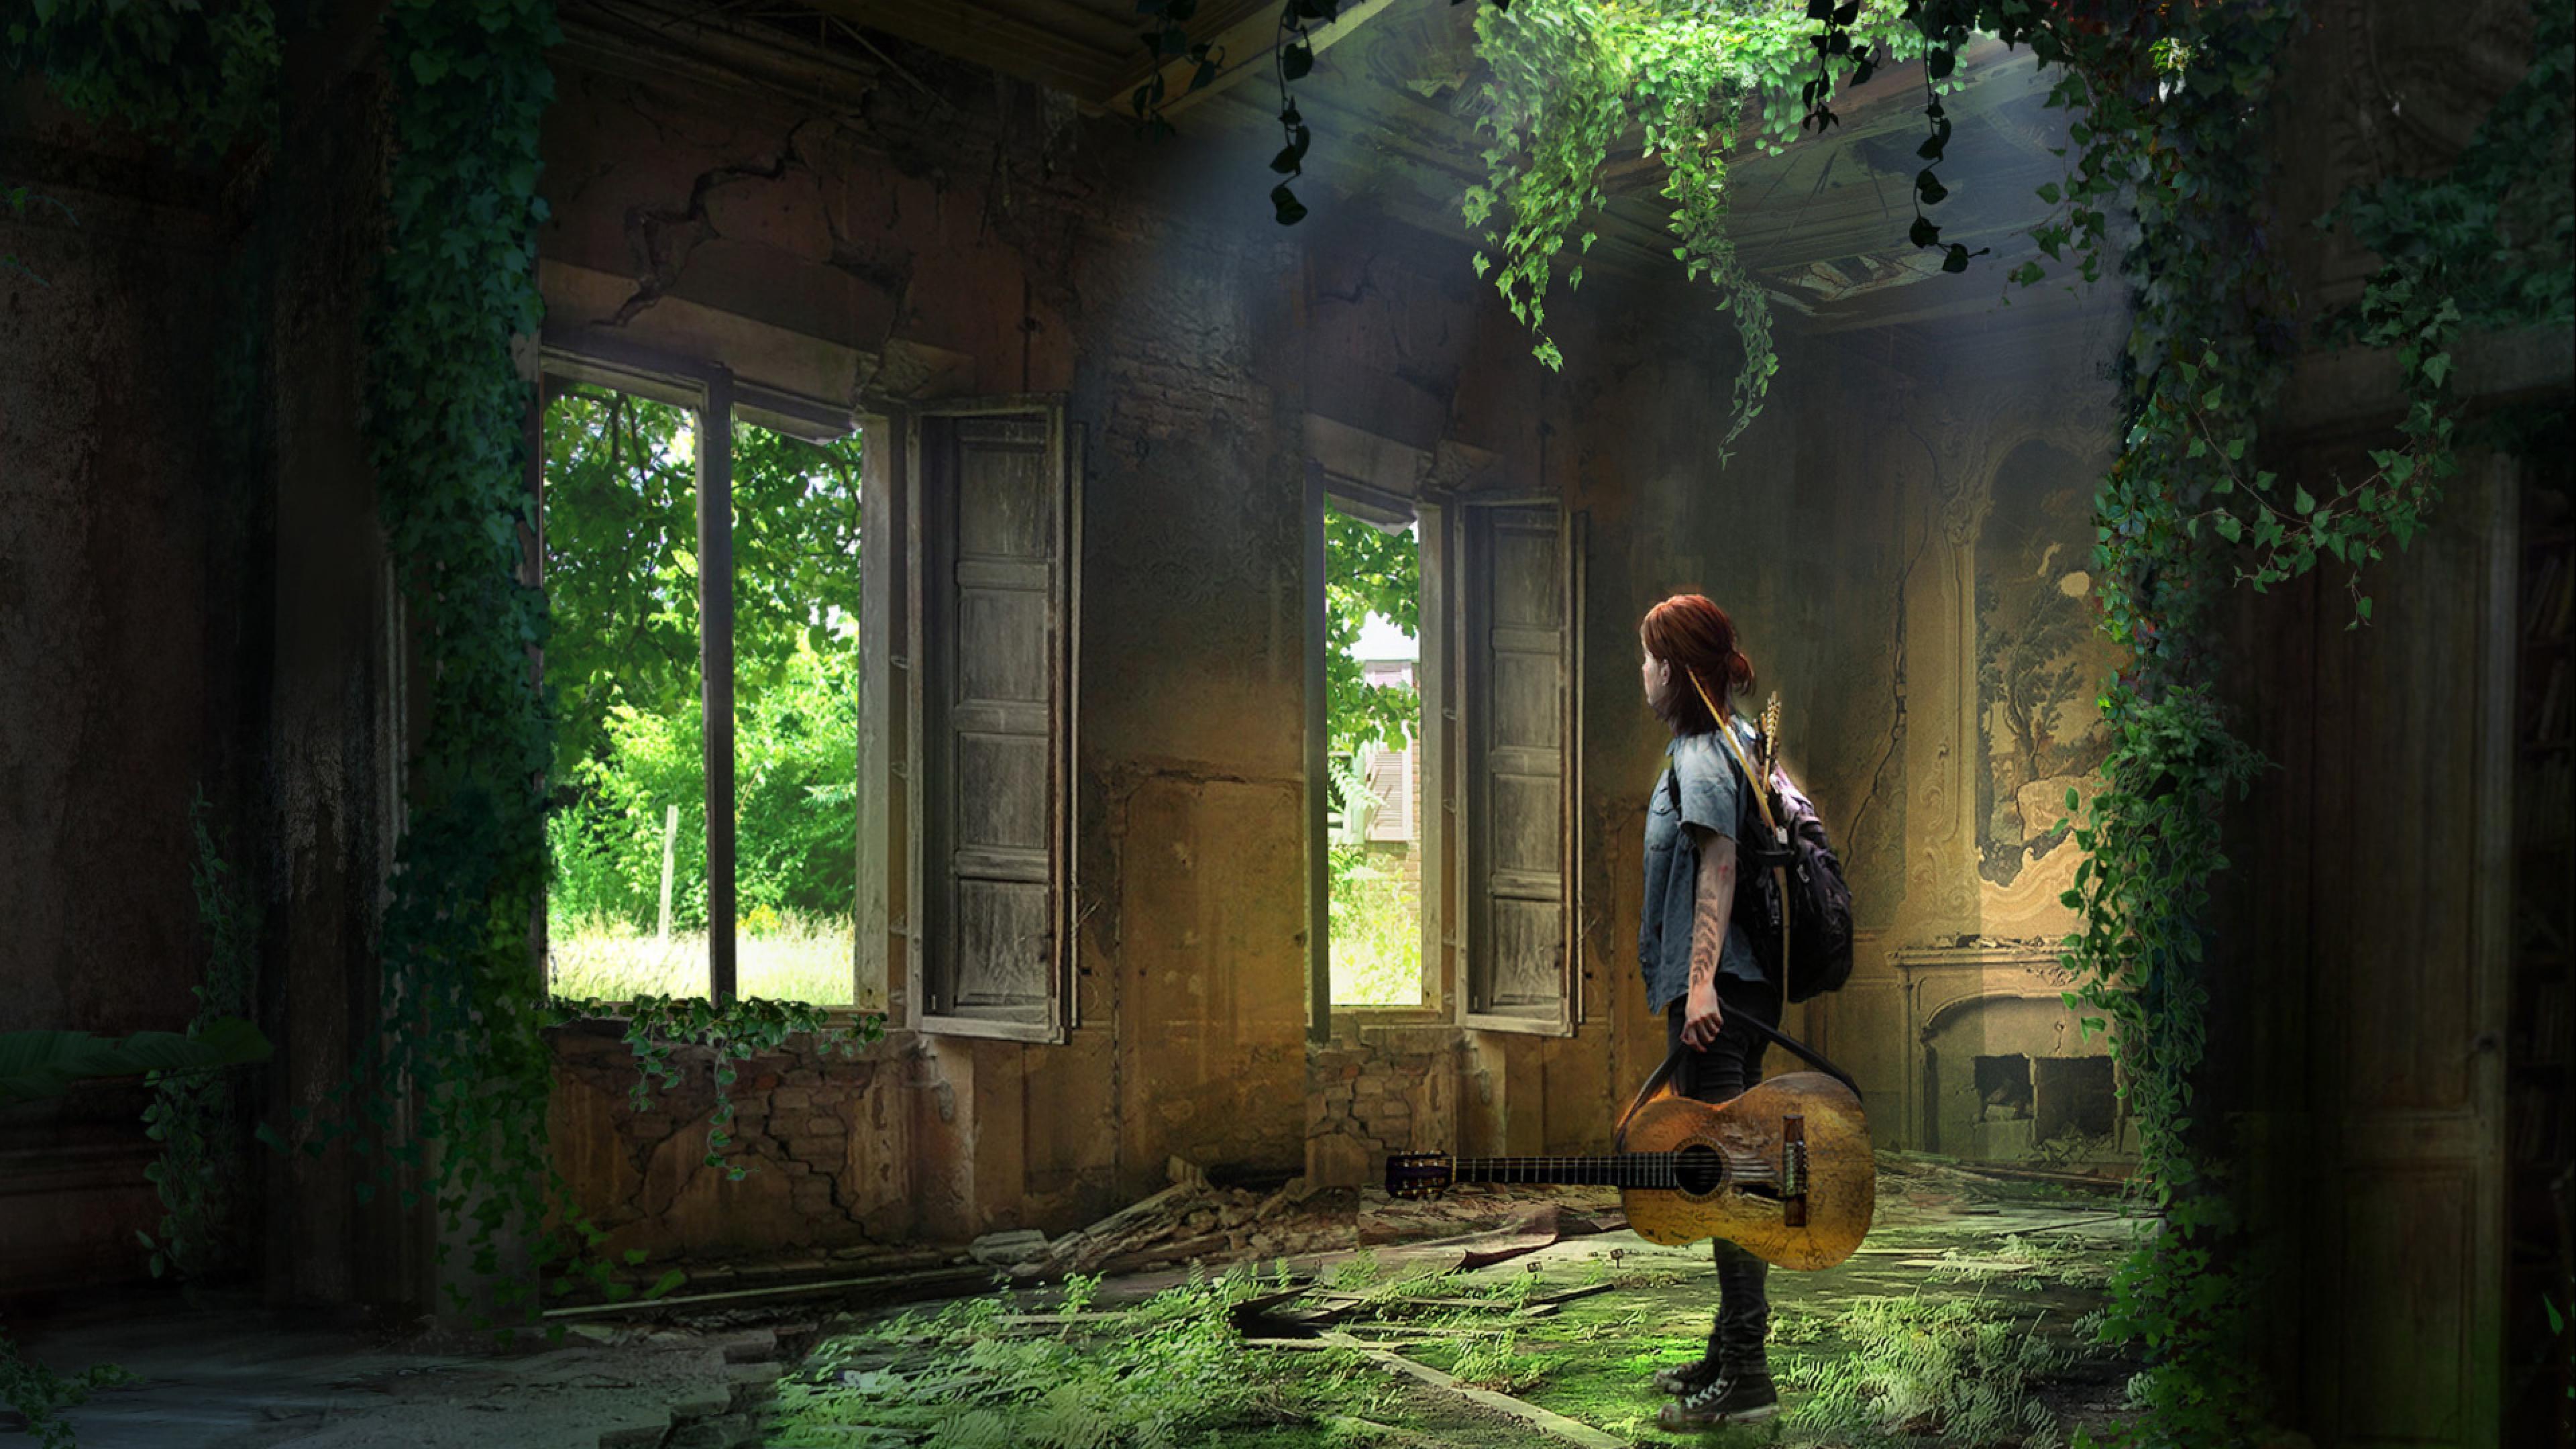 The Last Of Us 2 Wallpaper 4k Android - Singebloggg